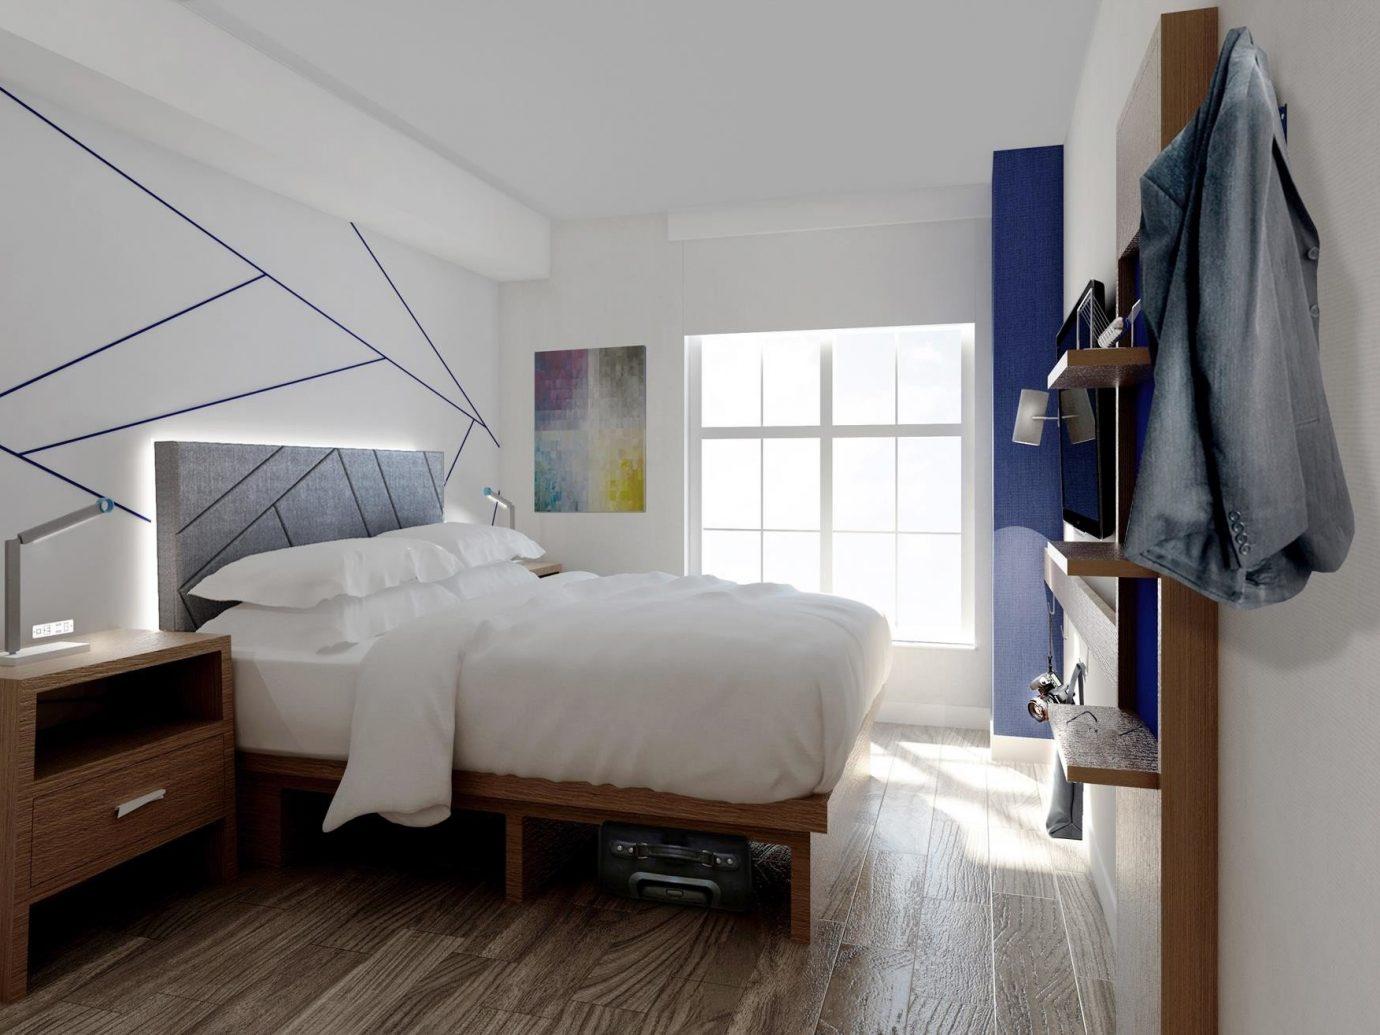 Trip Ideas indoor wall floor bed room property Bedroom furniture interior design home living room cottage hotel real estate apartment loft